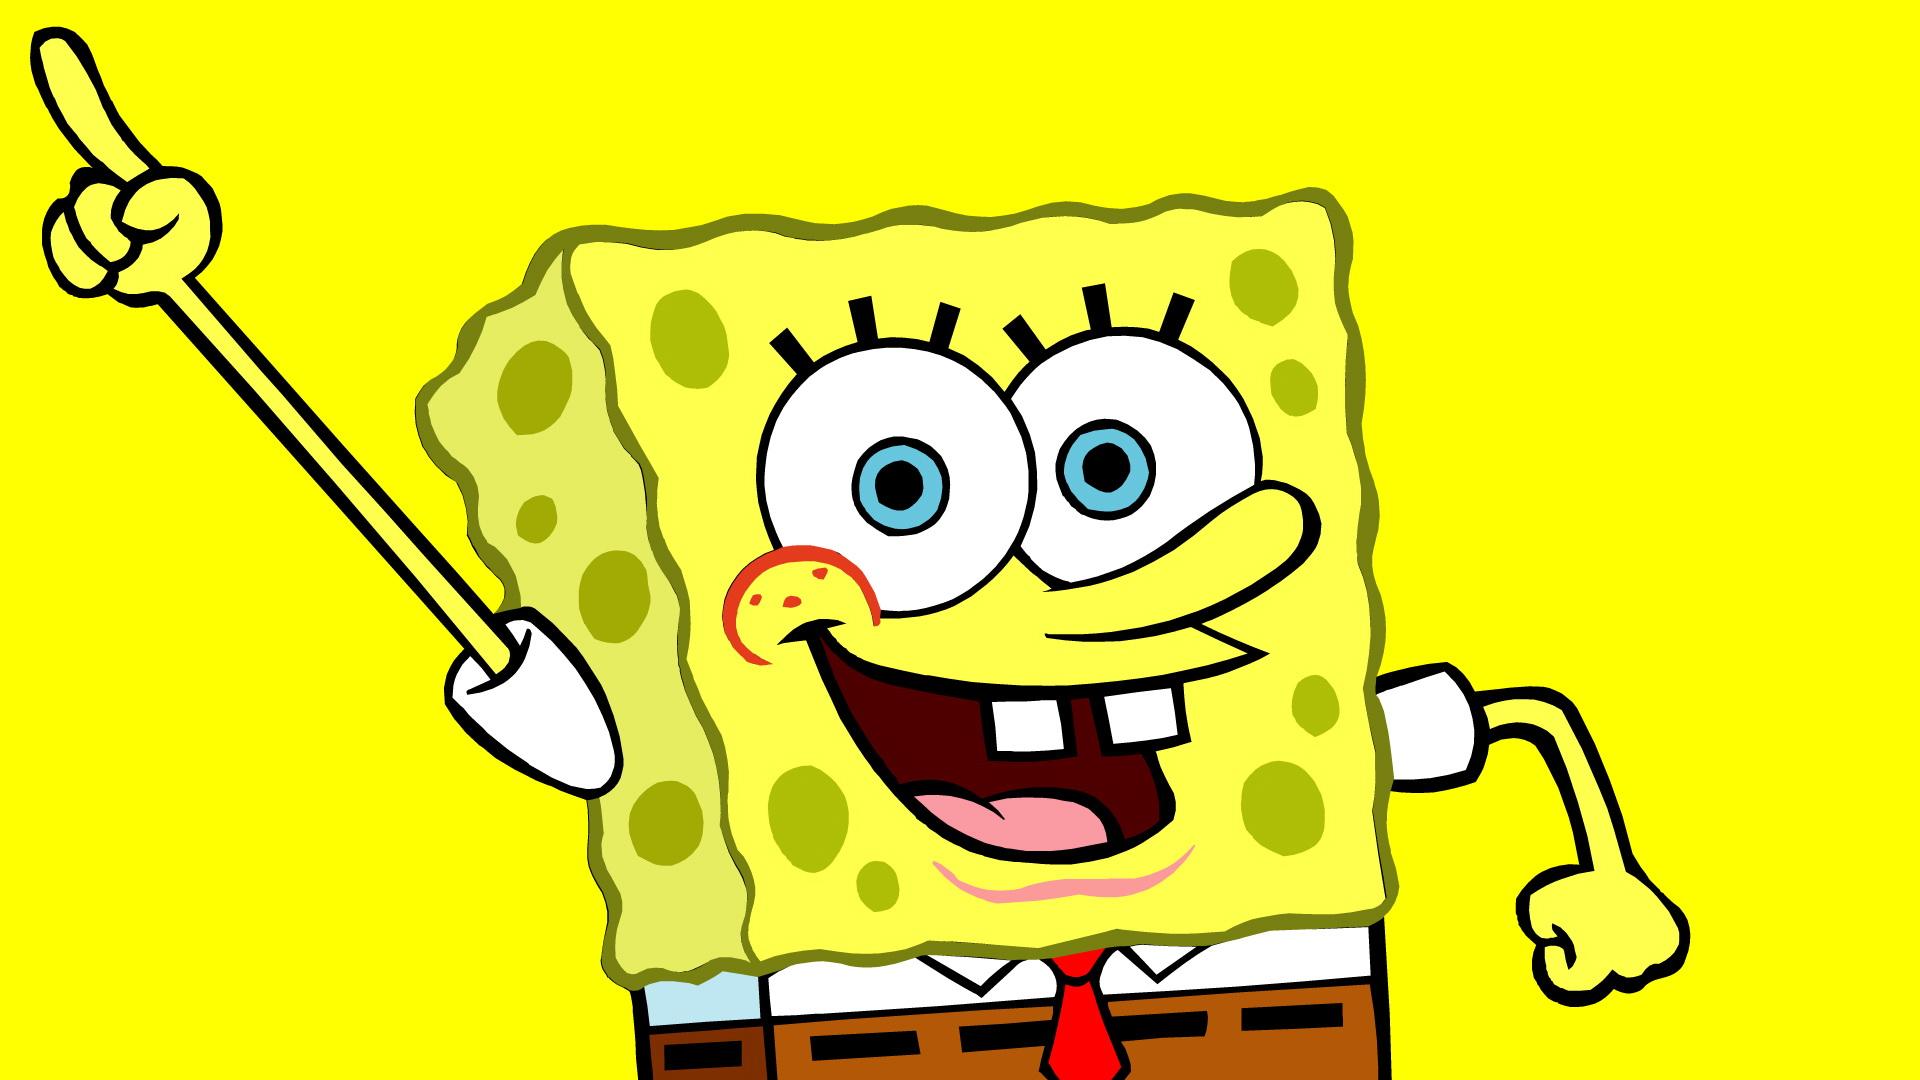 high resolution spongebob squarepants - photo #25